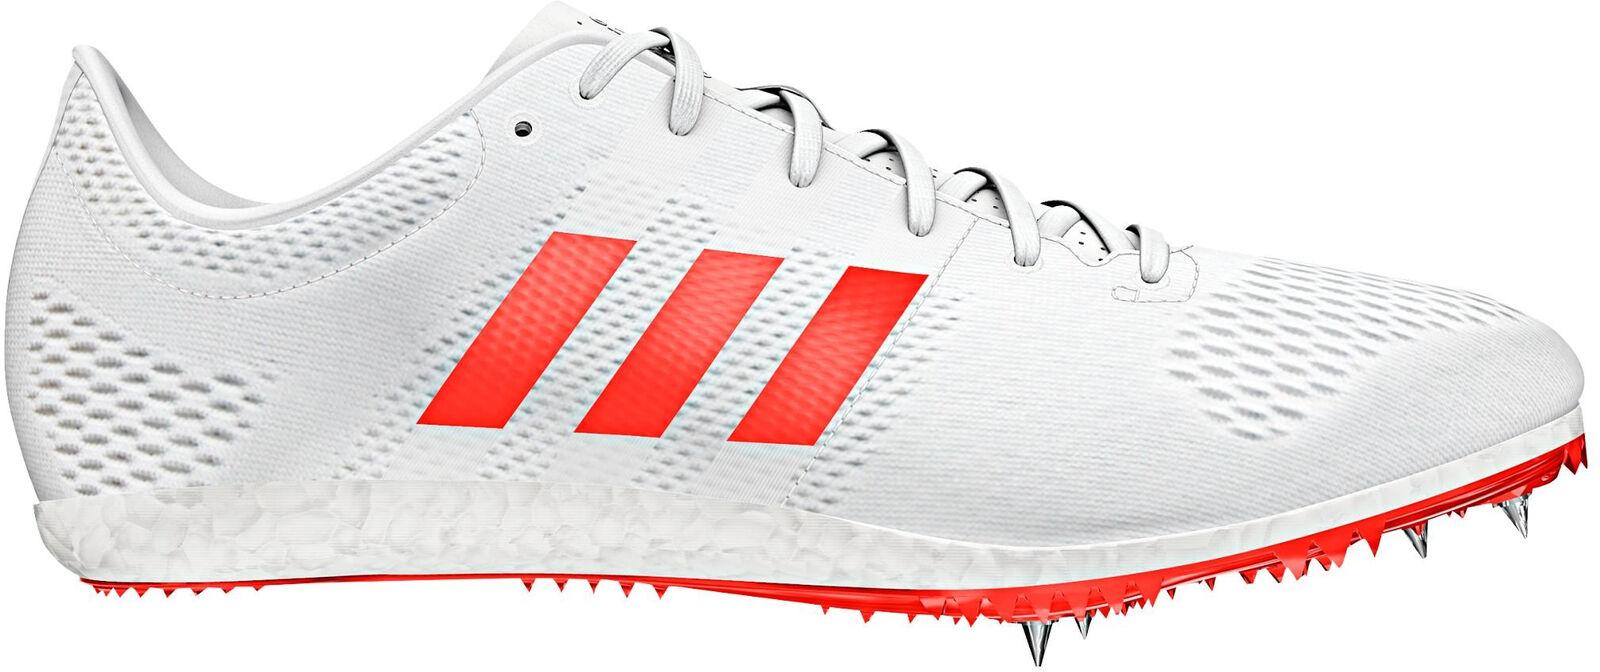 9b3d210d9 Adidas Adizero Rio Avanti Boost Spikes - White Running nzdxkj8251-Women